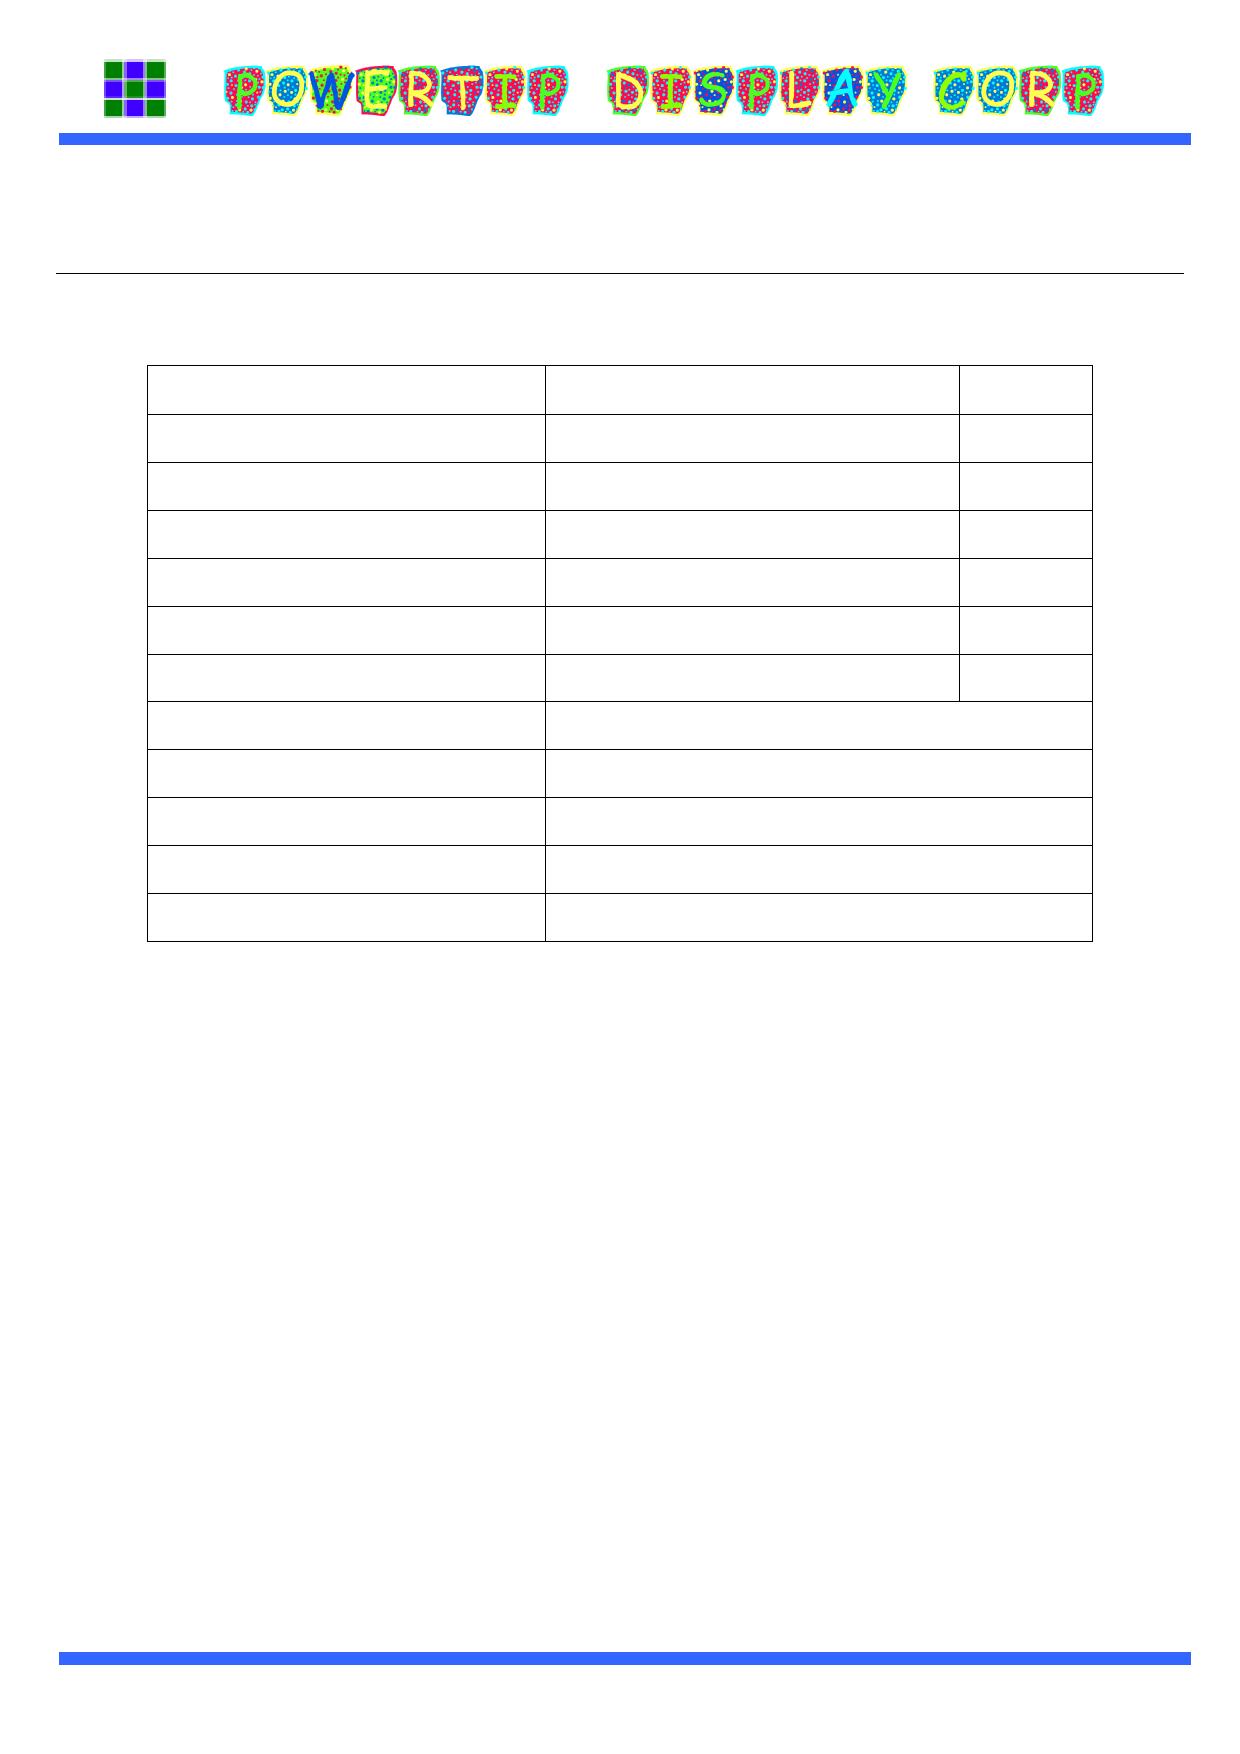 PE12864LRU-004-H pdf, 반도체, 판매, 대치품